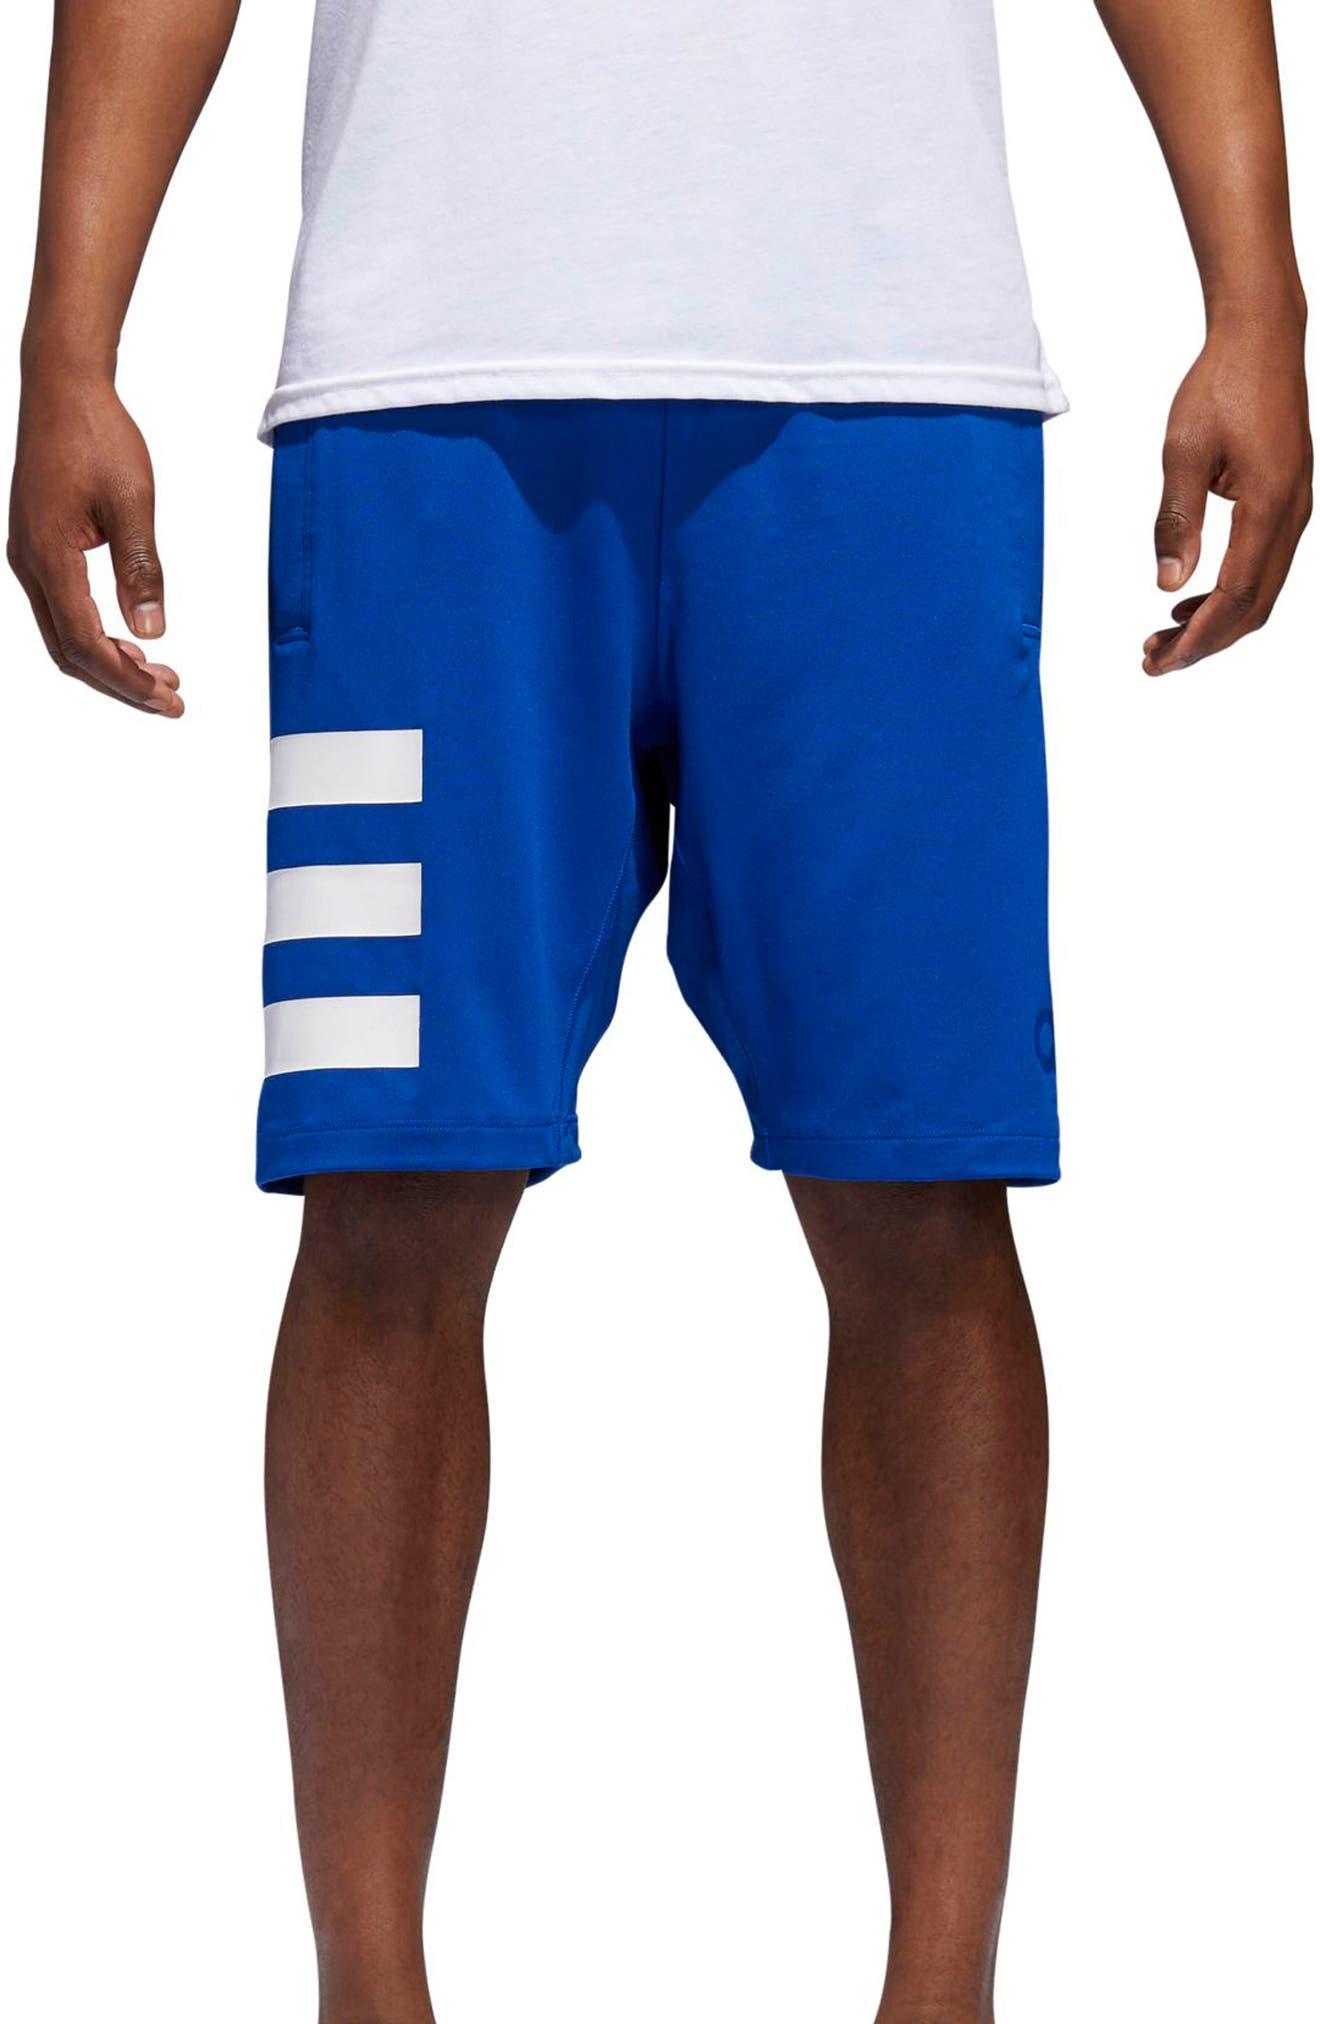 SB Hype Icon Shorts,                             Main thumbnail 1, color,                             Collegiate Royal / White